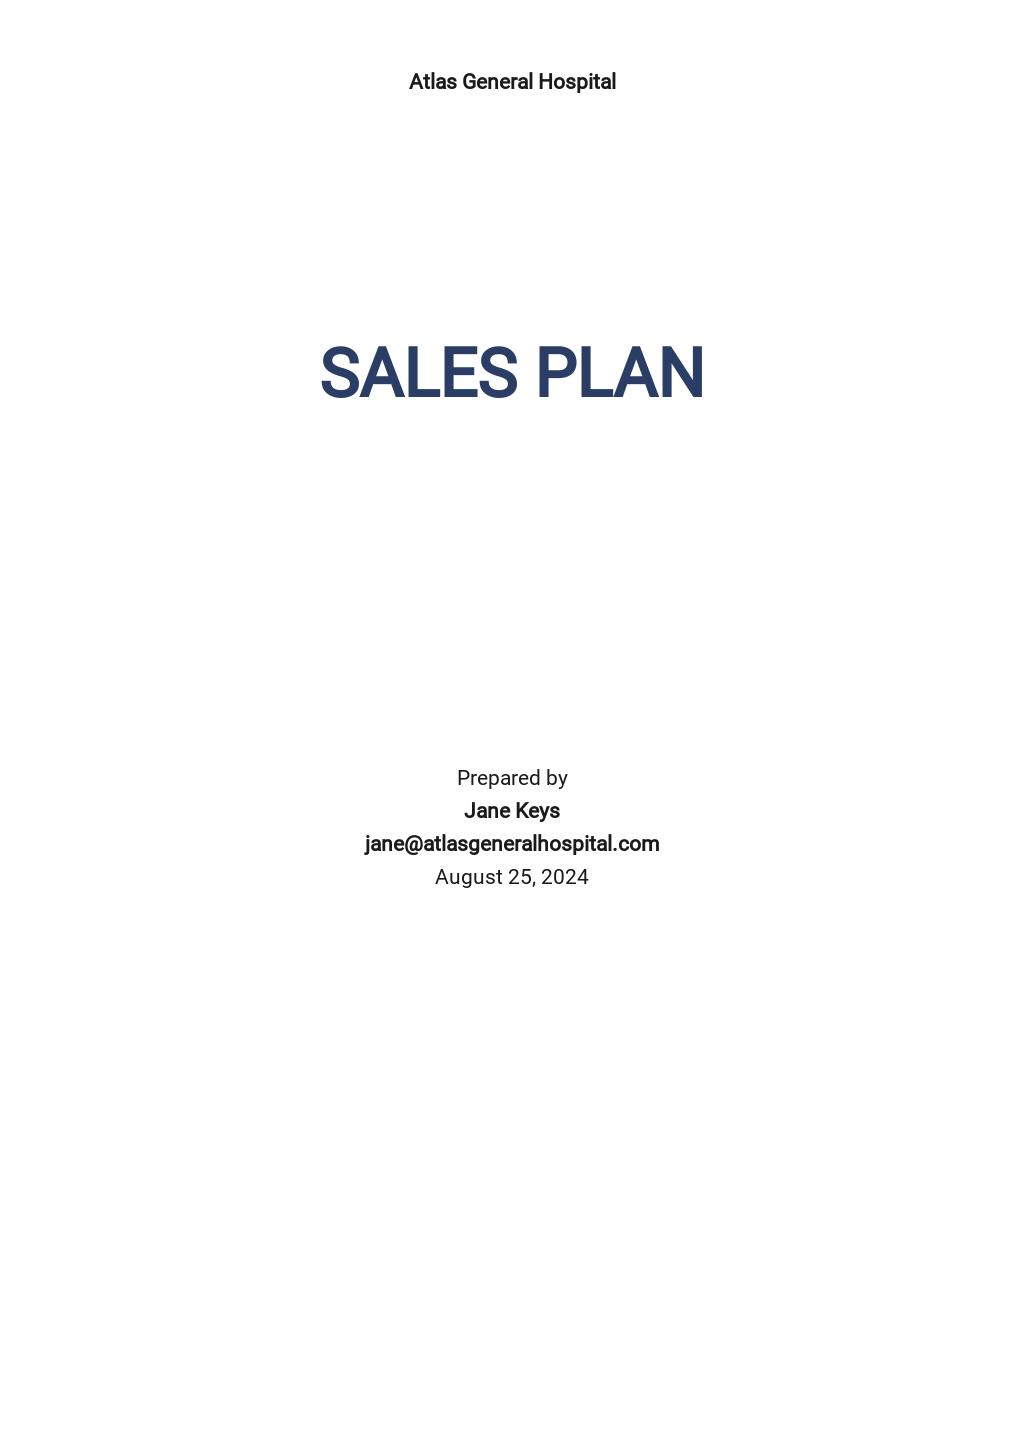 Hospital Sales Plan Template.jpe